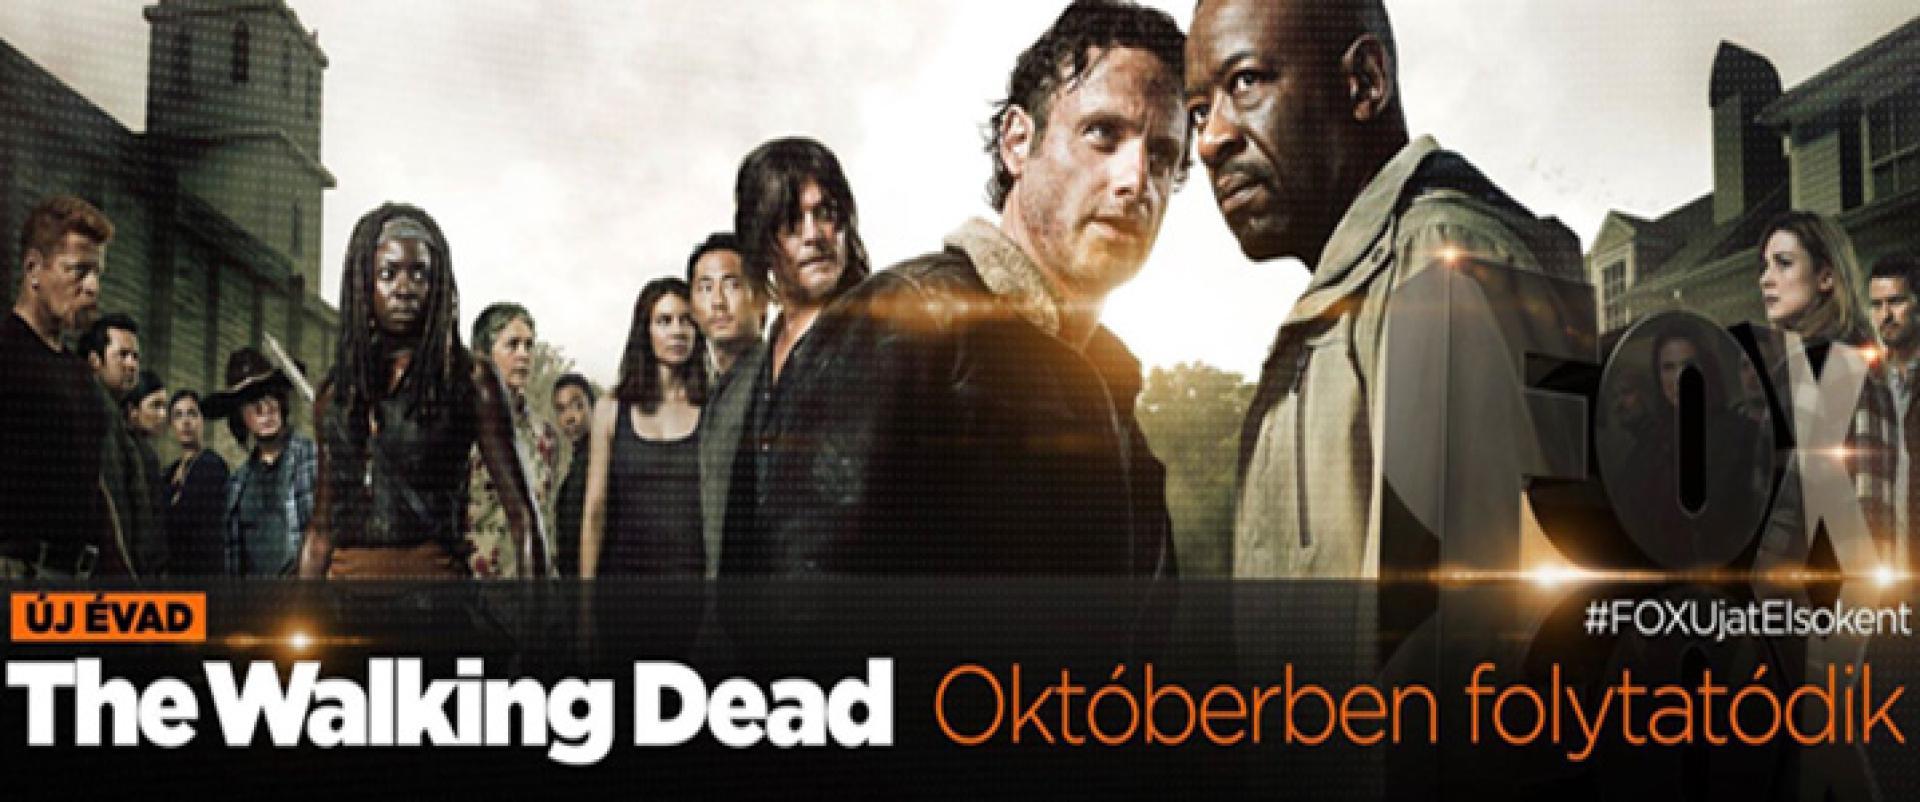 The Walking Dead, 6. évad: nagyon spoileres infók